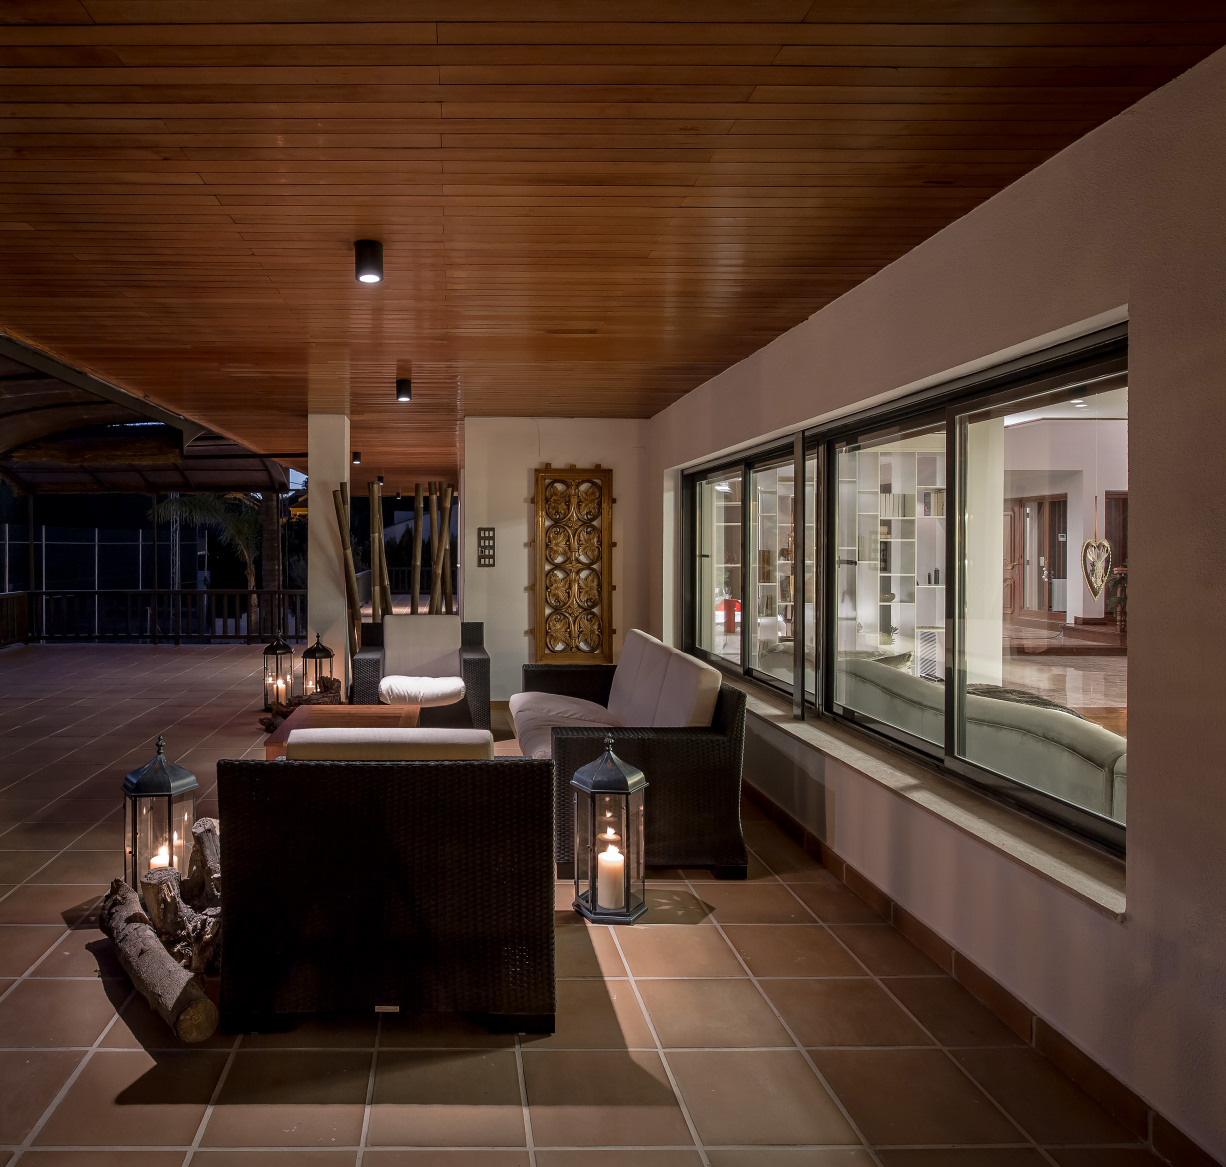 fotografia-arquitectura-valencia-german-cabo-laura_yerpes_canyada (29)